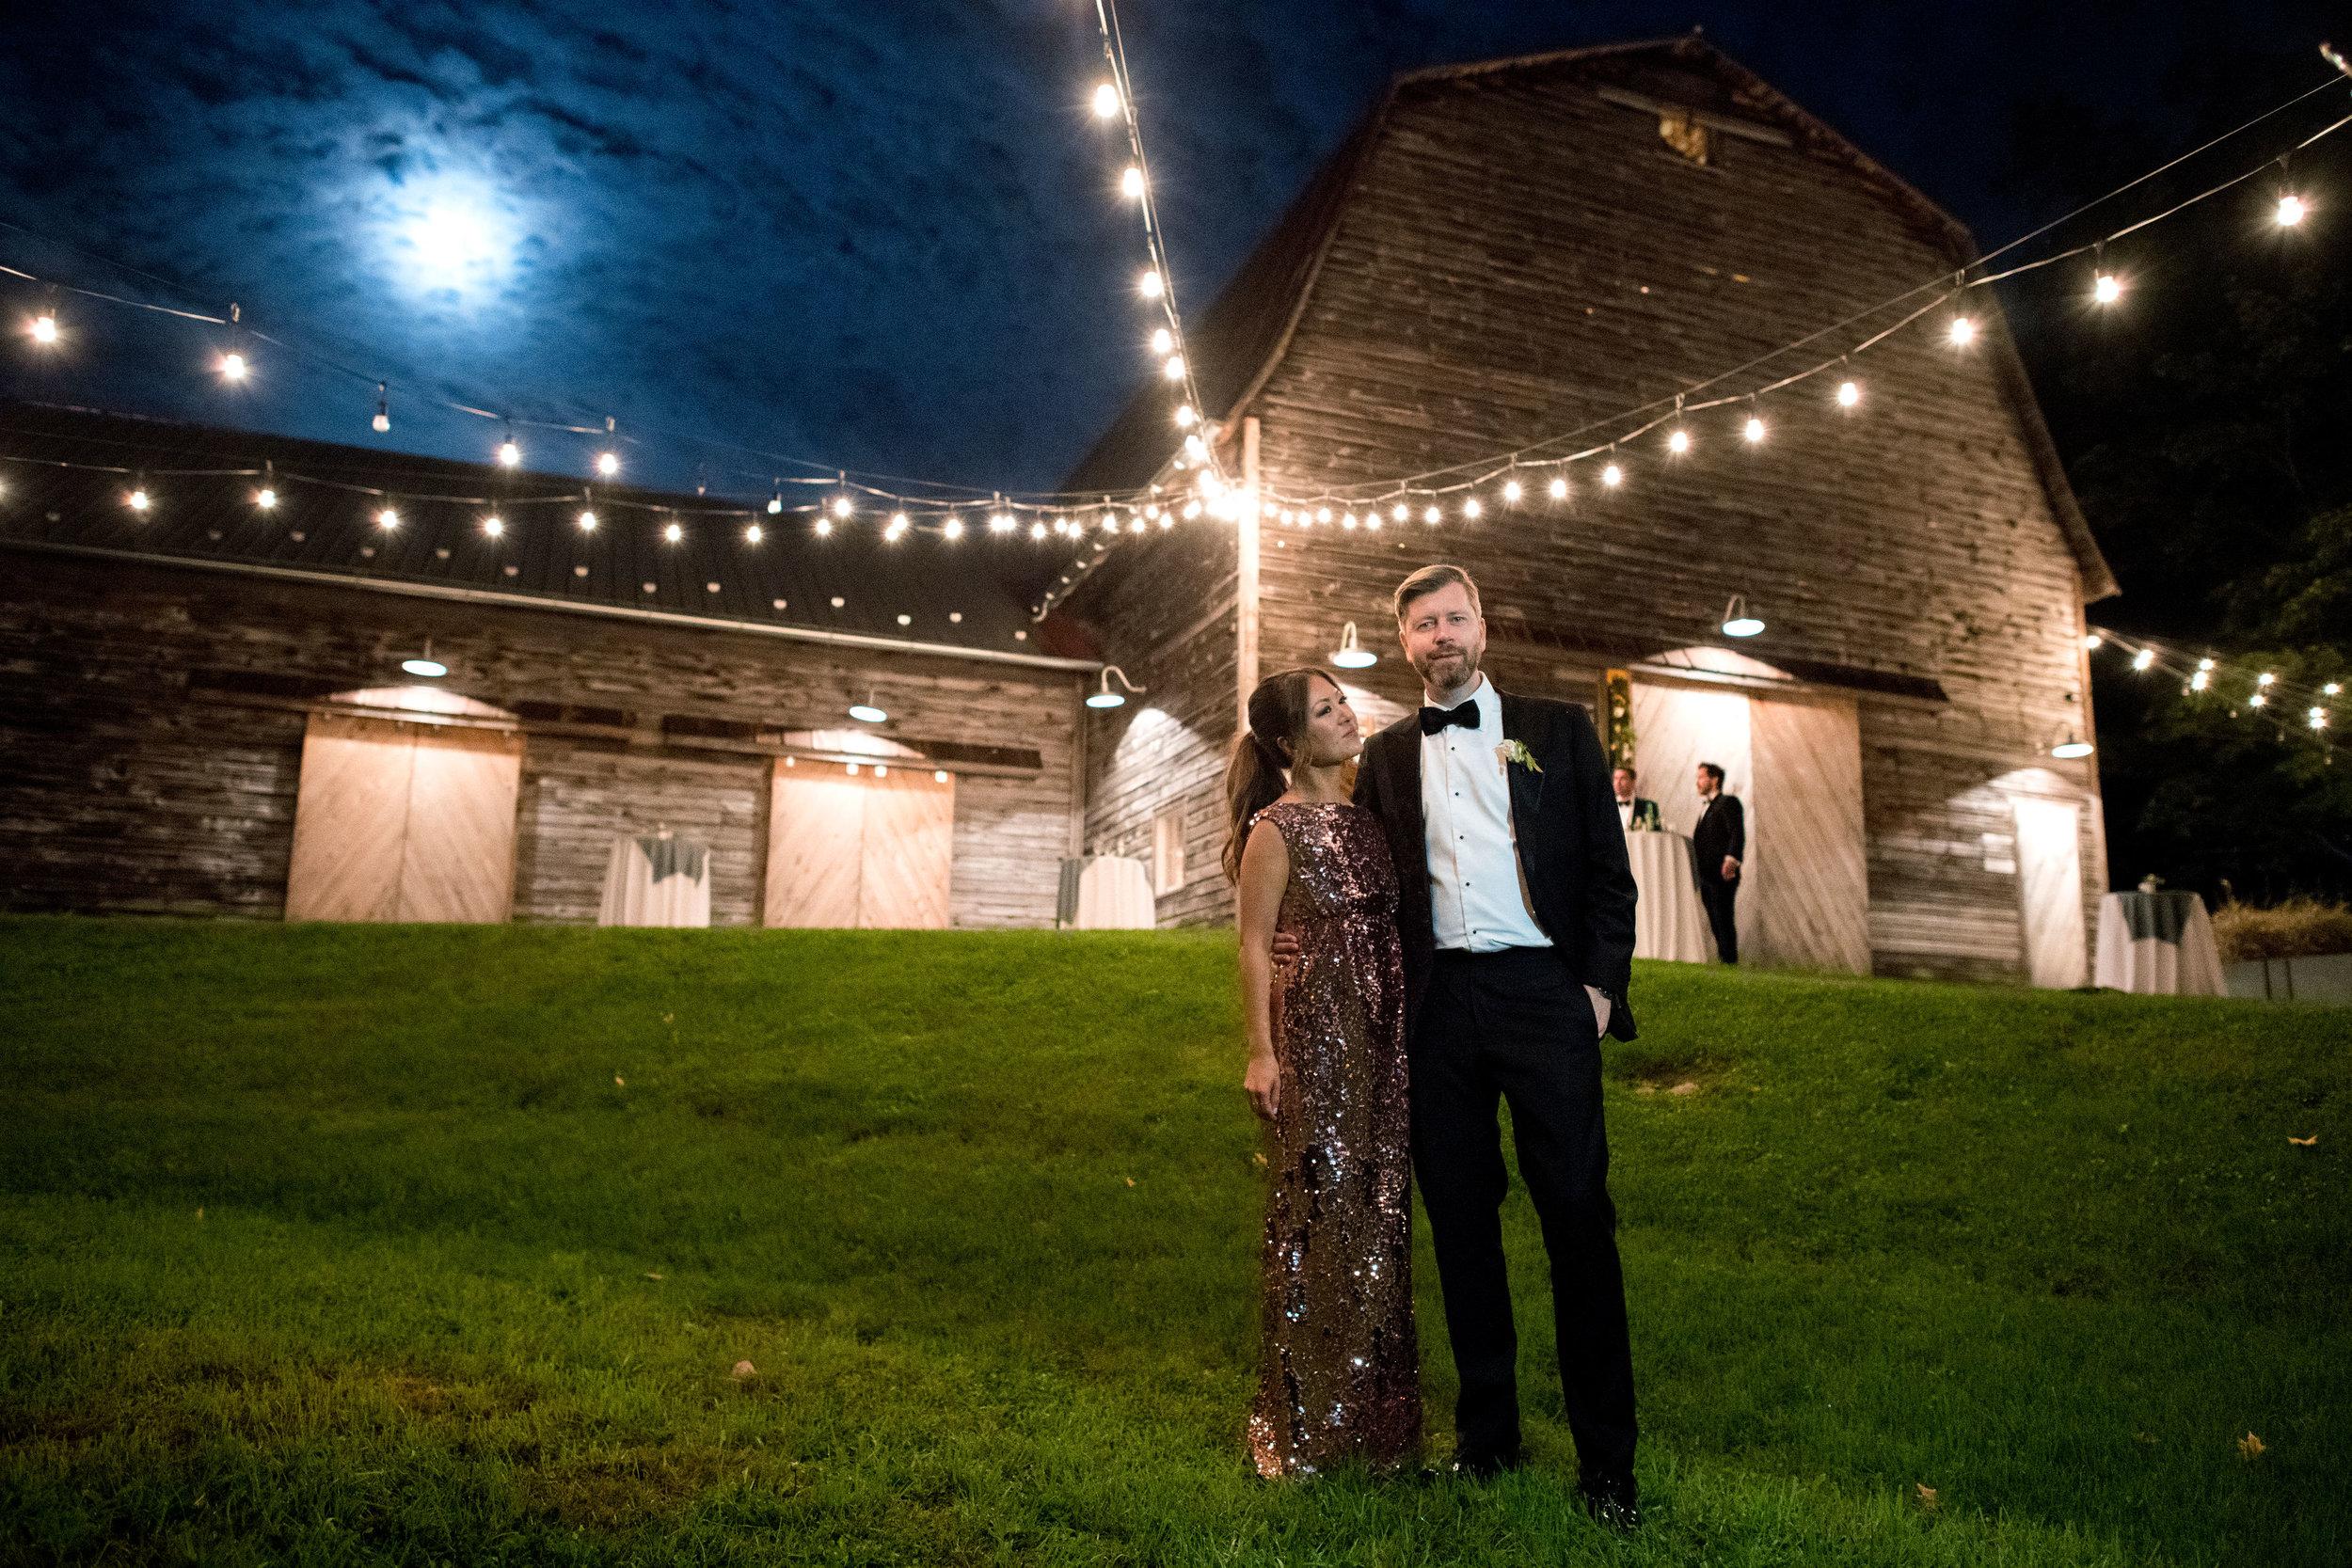 Barn Weddings LLG Events